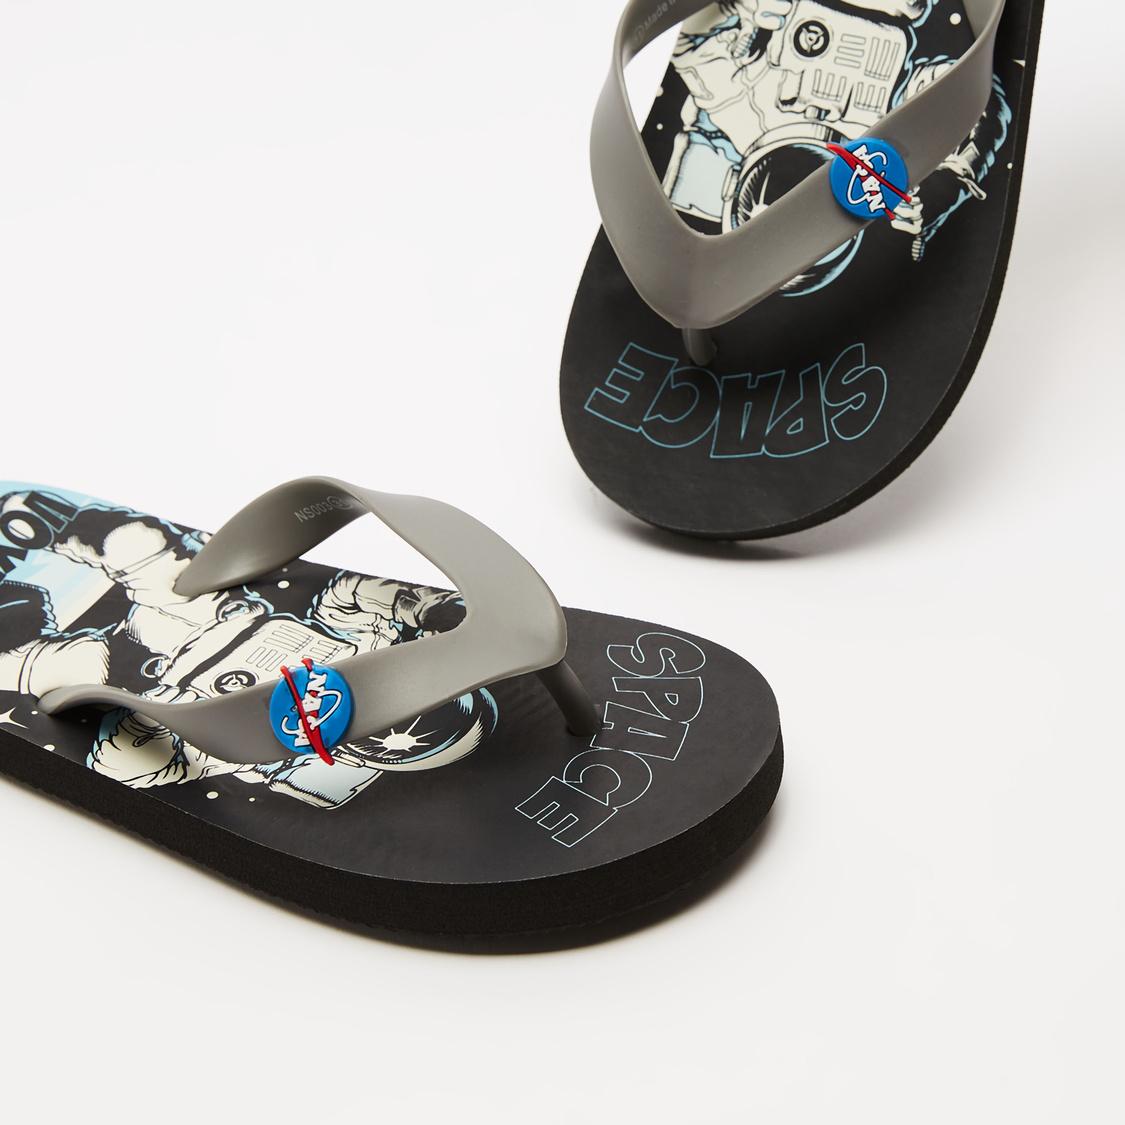 NASA Print Flip Flops with Applique Detail Straps